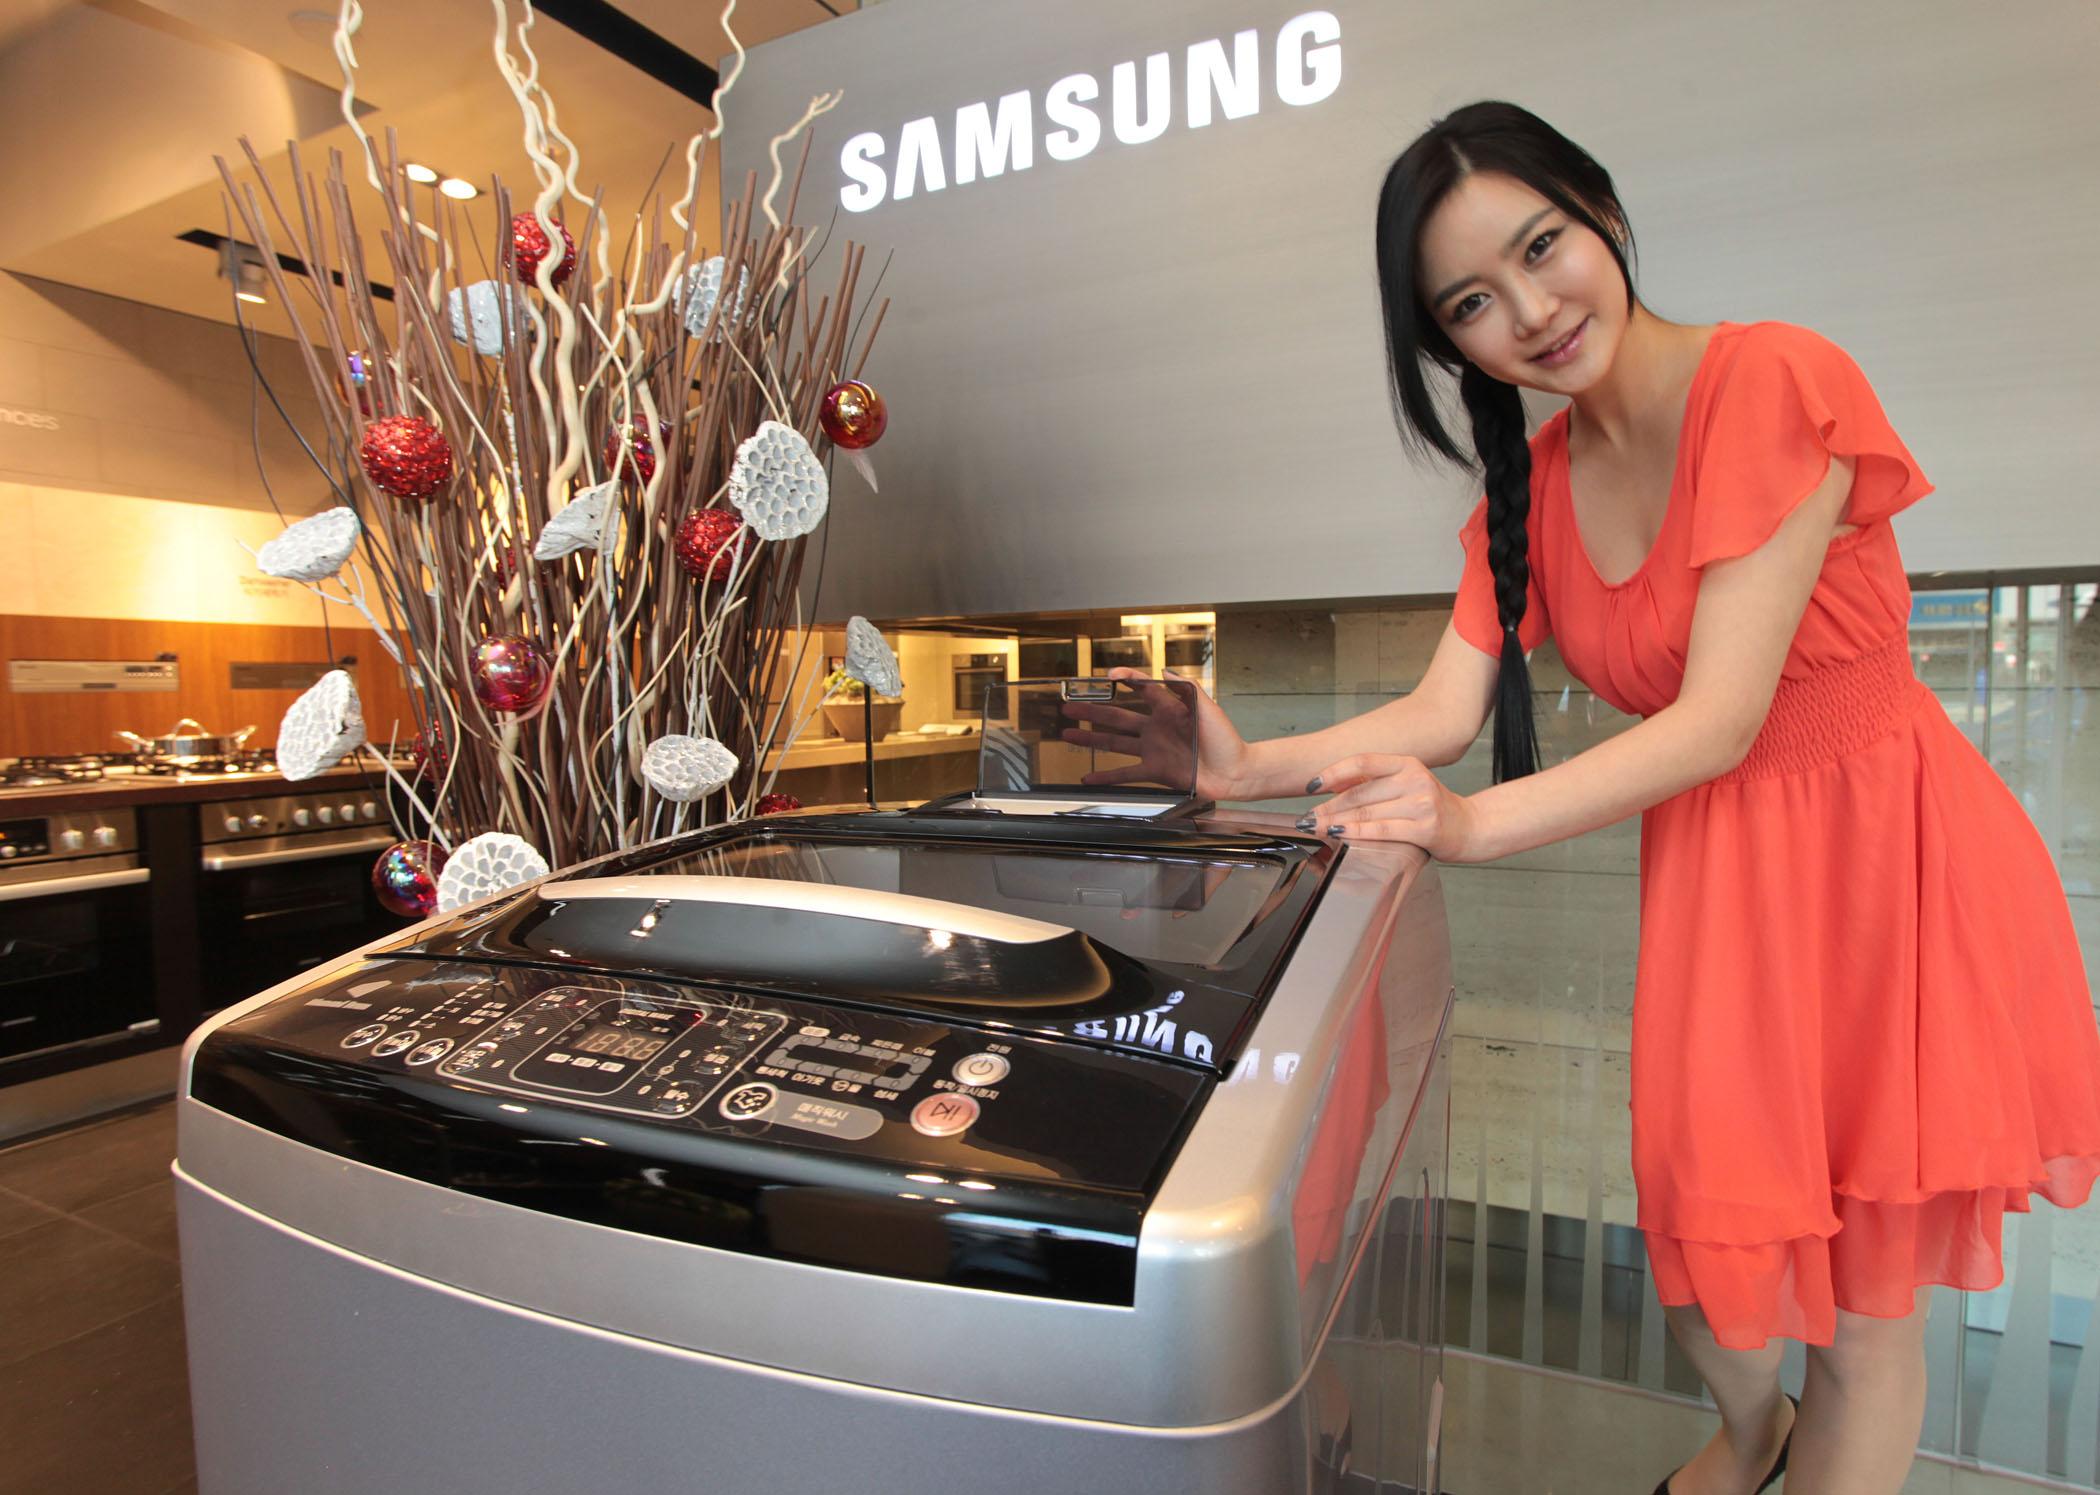 Bao Hanh Uy Quyen Samsung Trung Tam Bao Hanh May Giat Samsung Tai Ha Noi